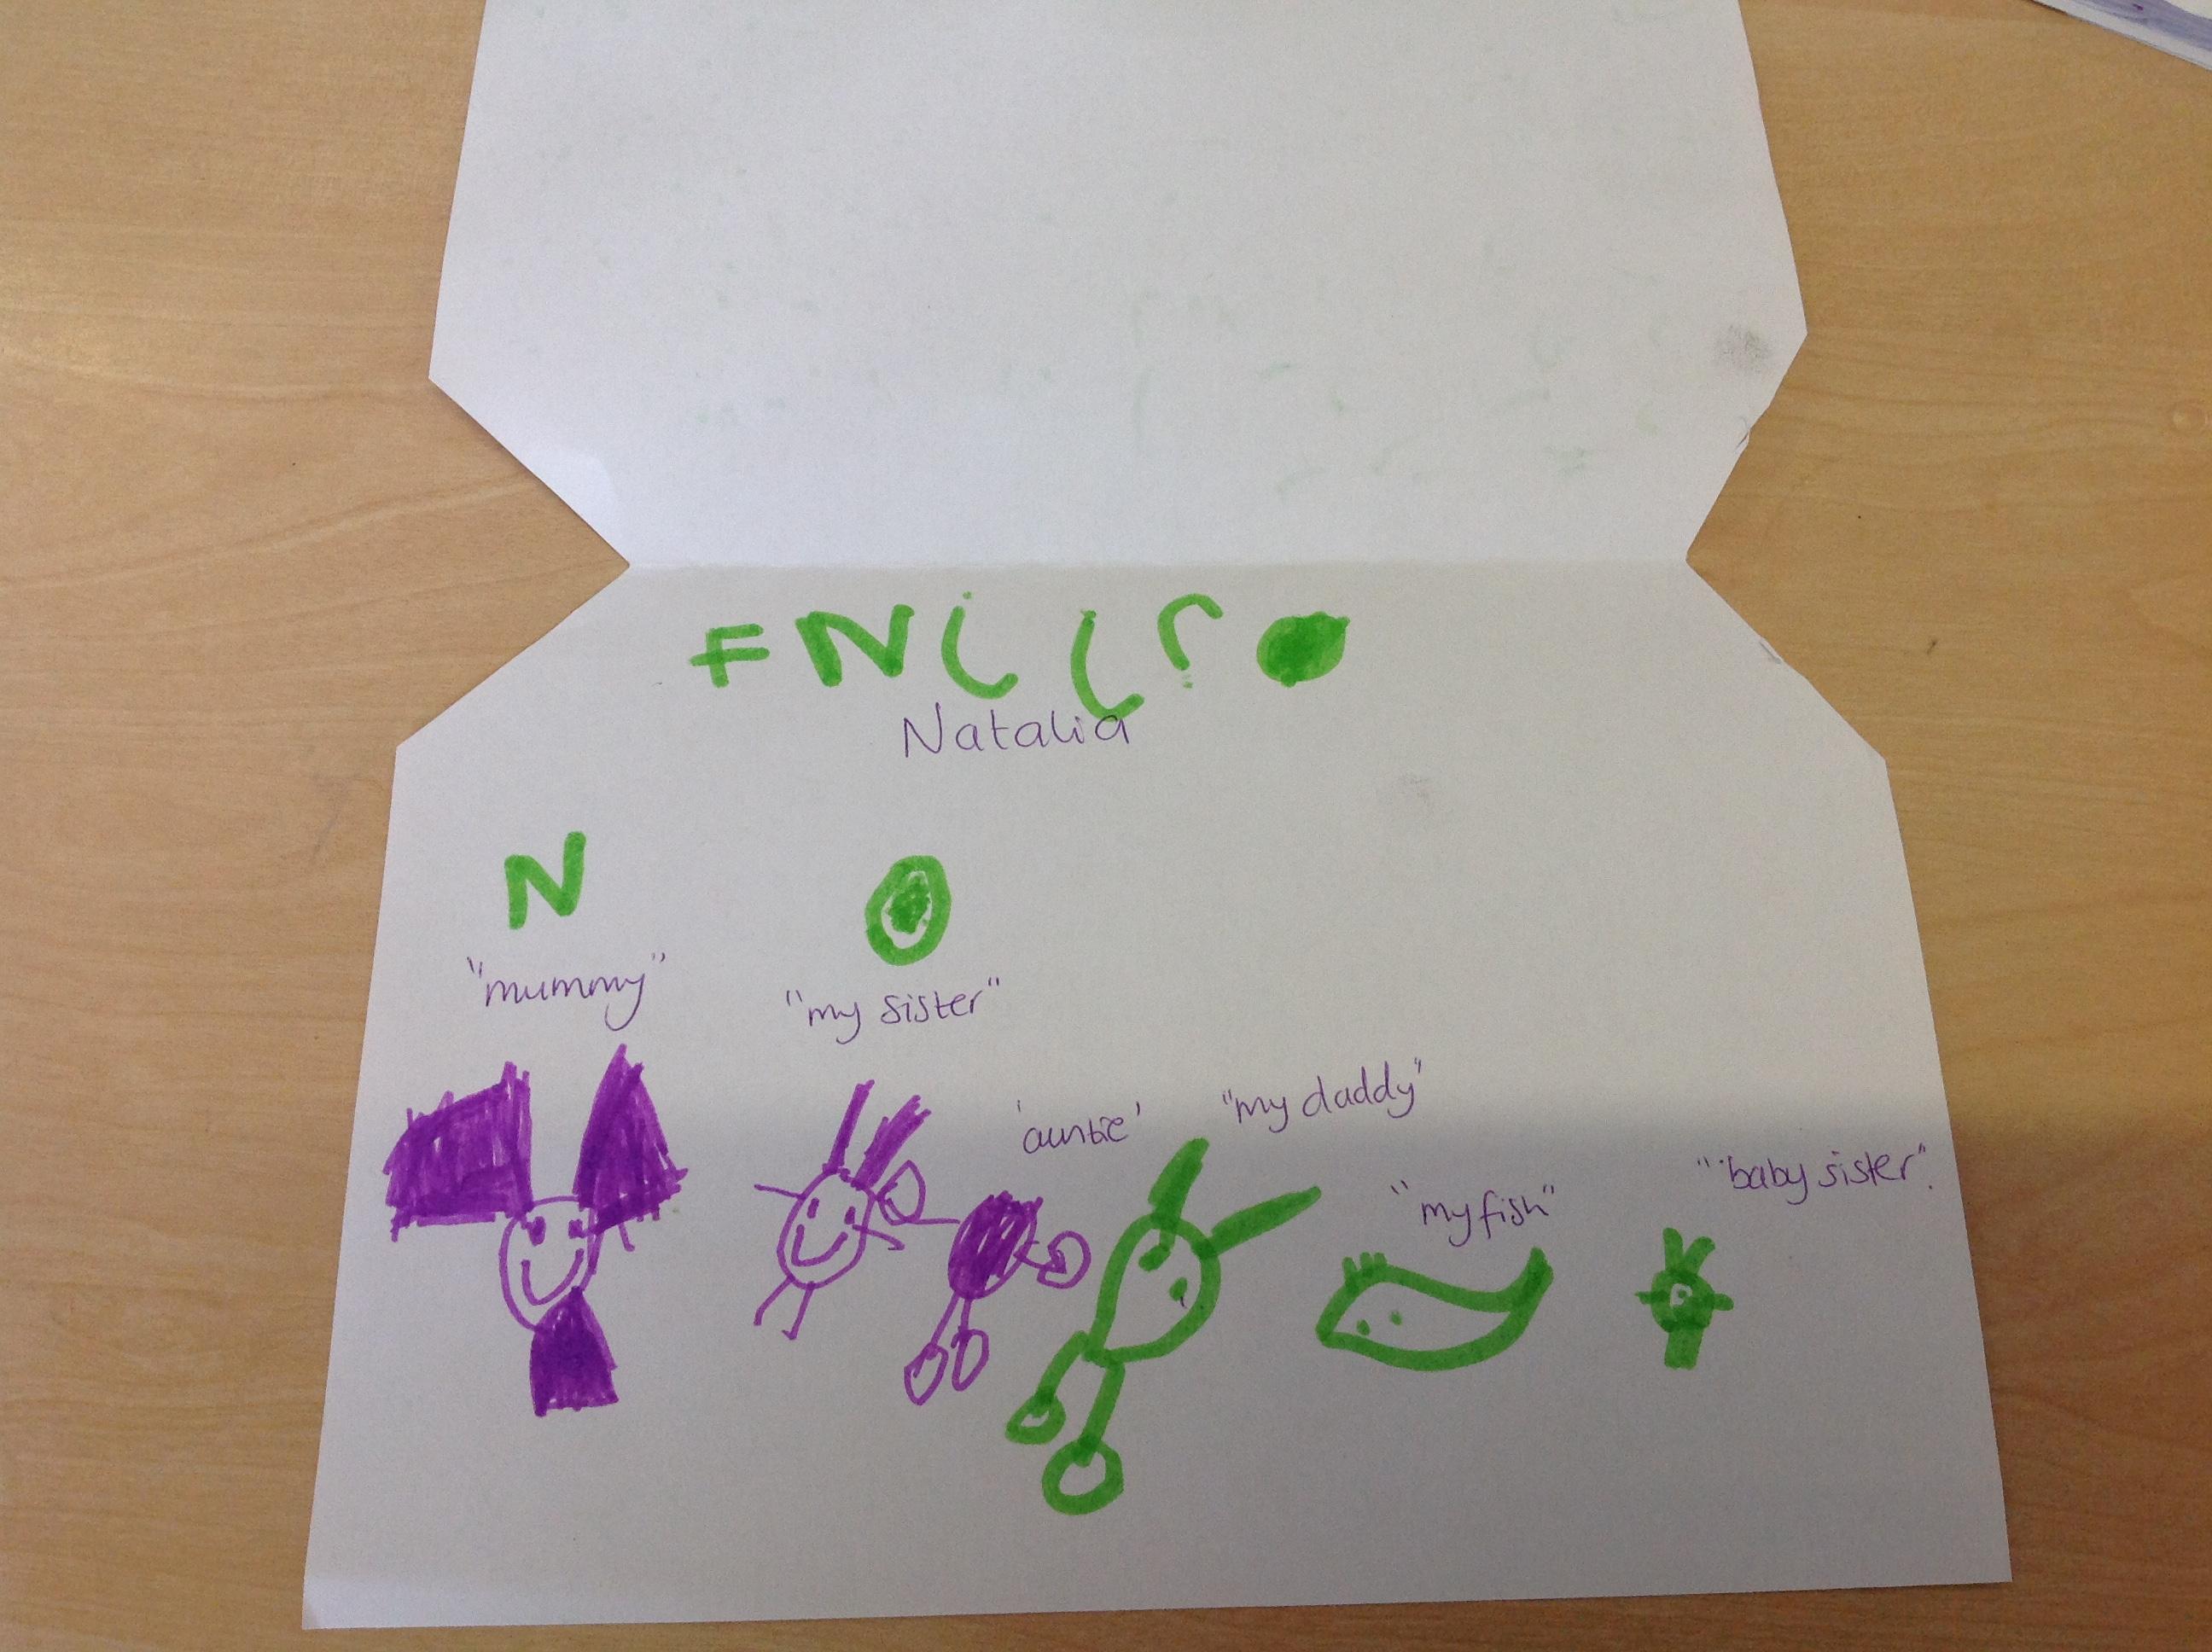 Natalia's brilliant work!